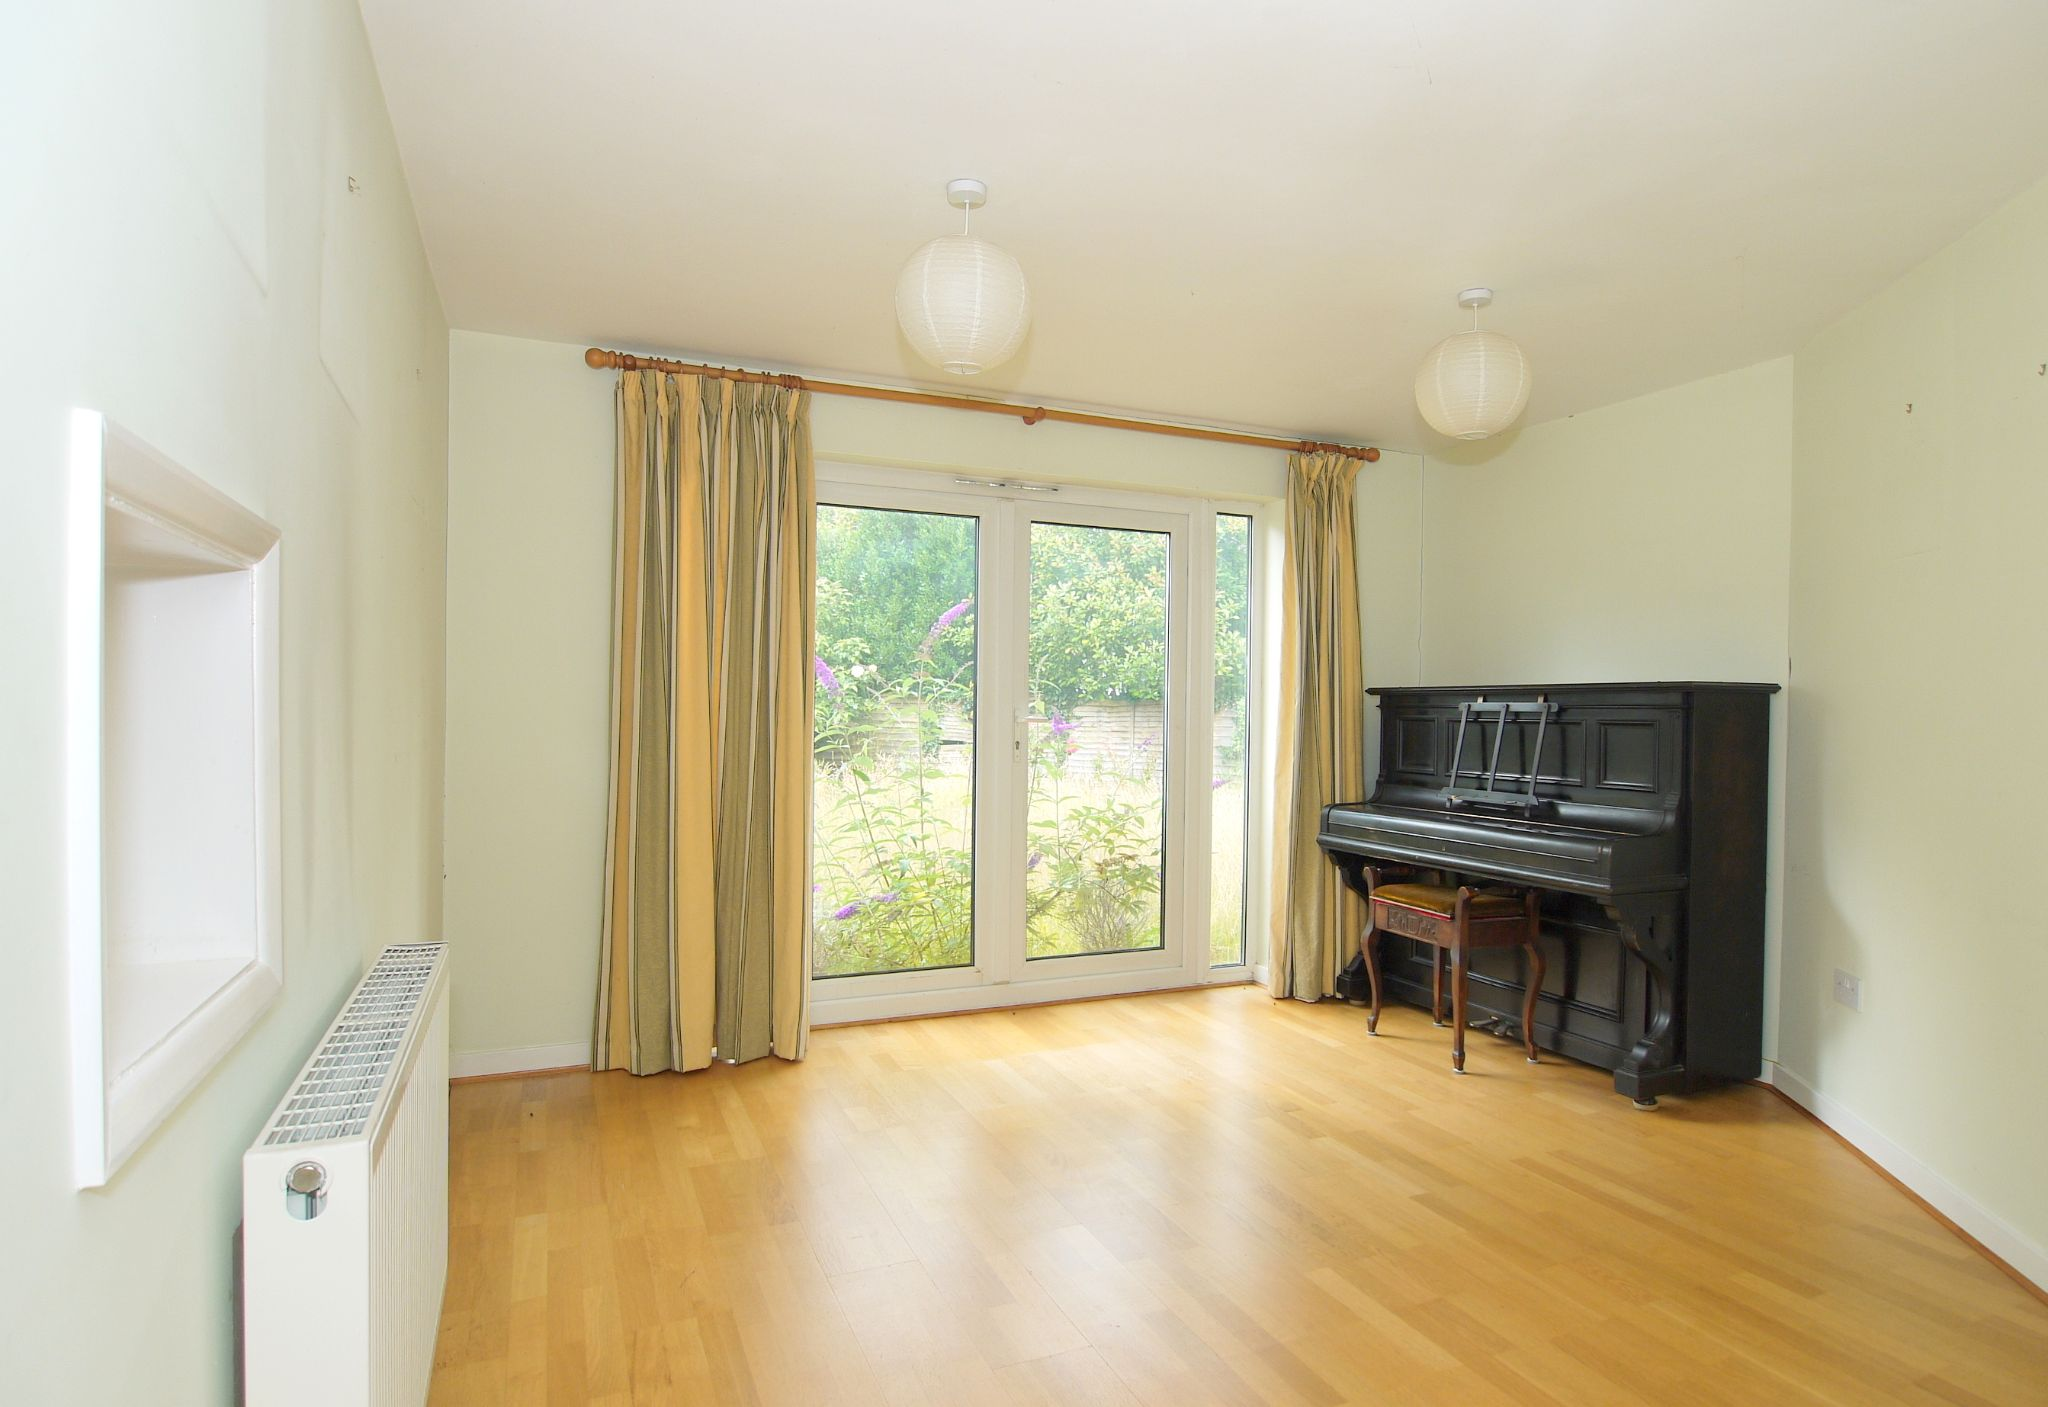 5 bedroom semi-detached house Sold in Sevenoaks - Photograph 2